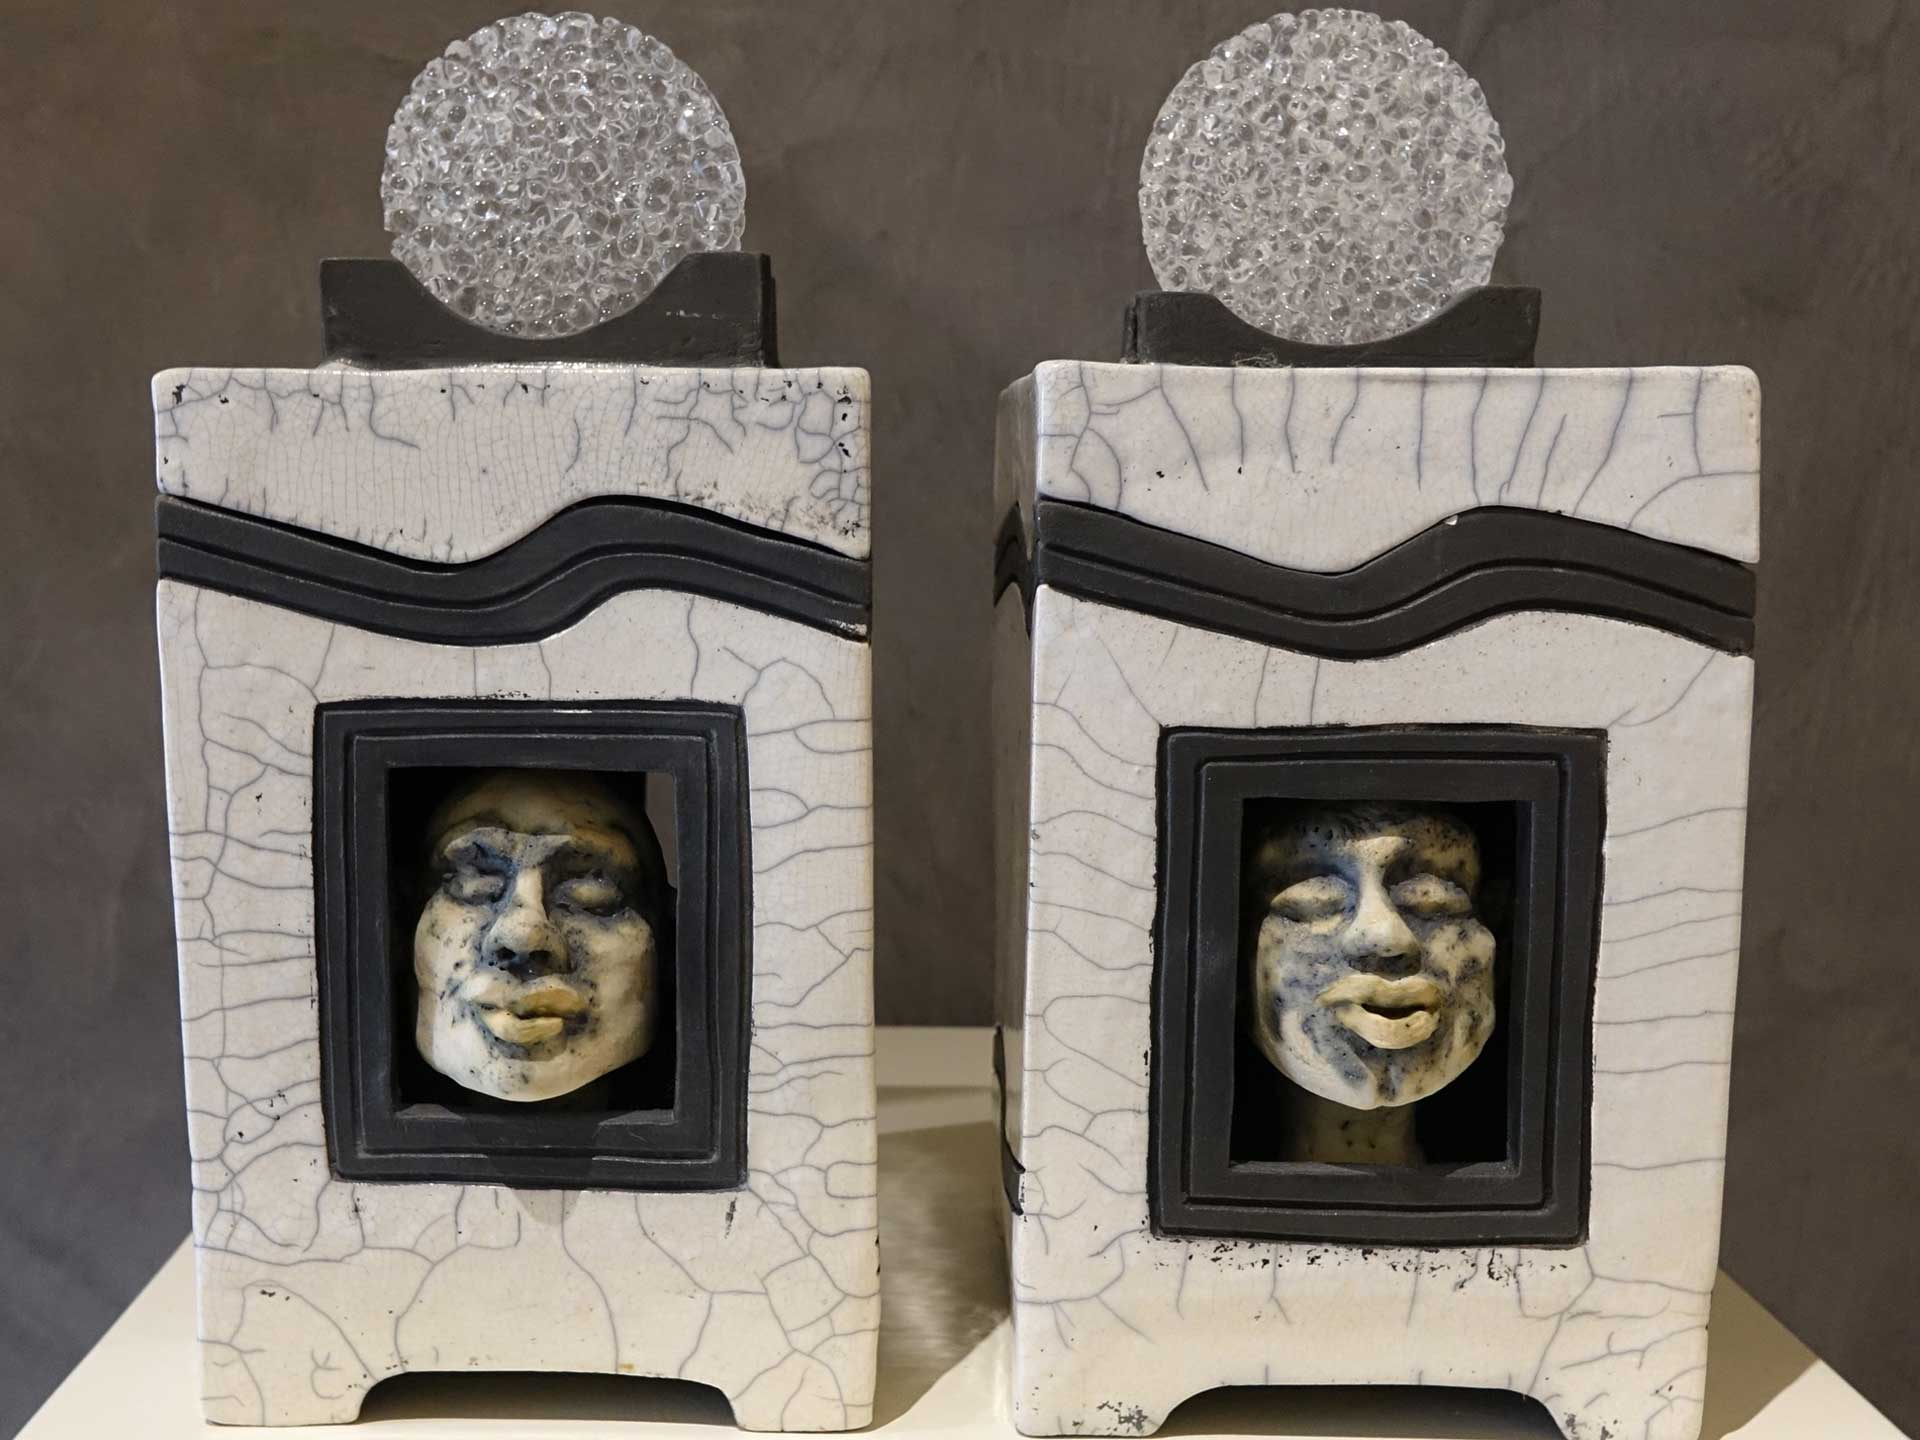 Dosen Keramik Glas Rakubrand